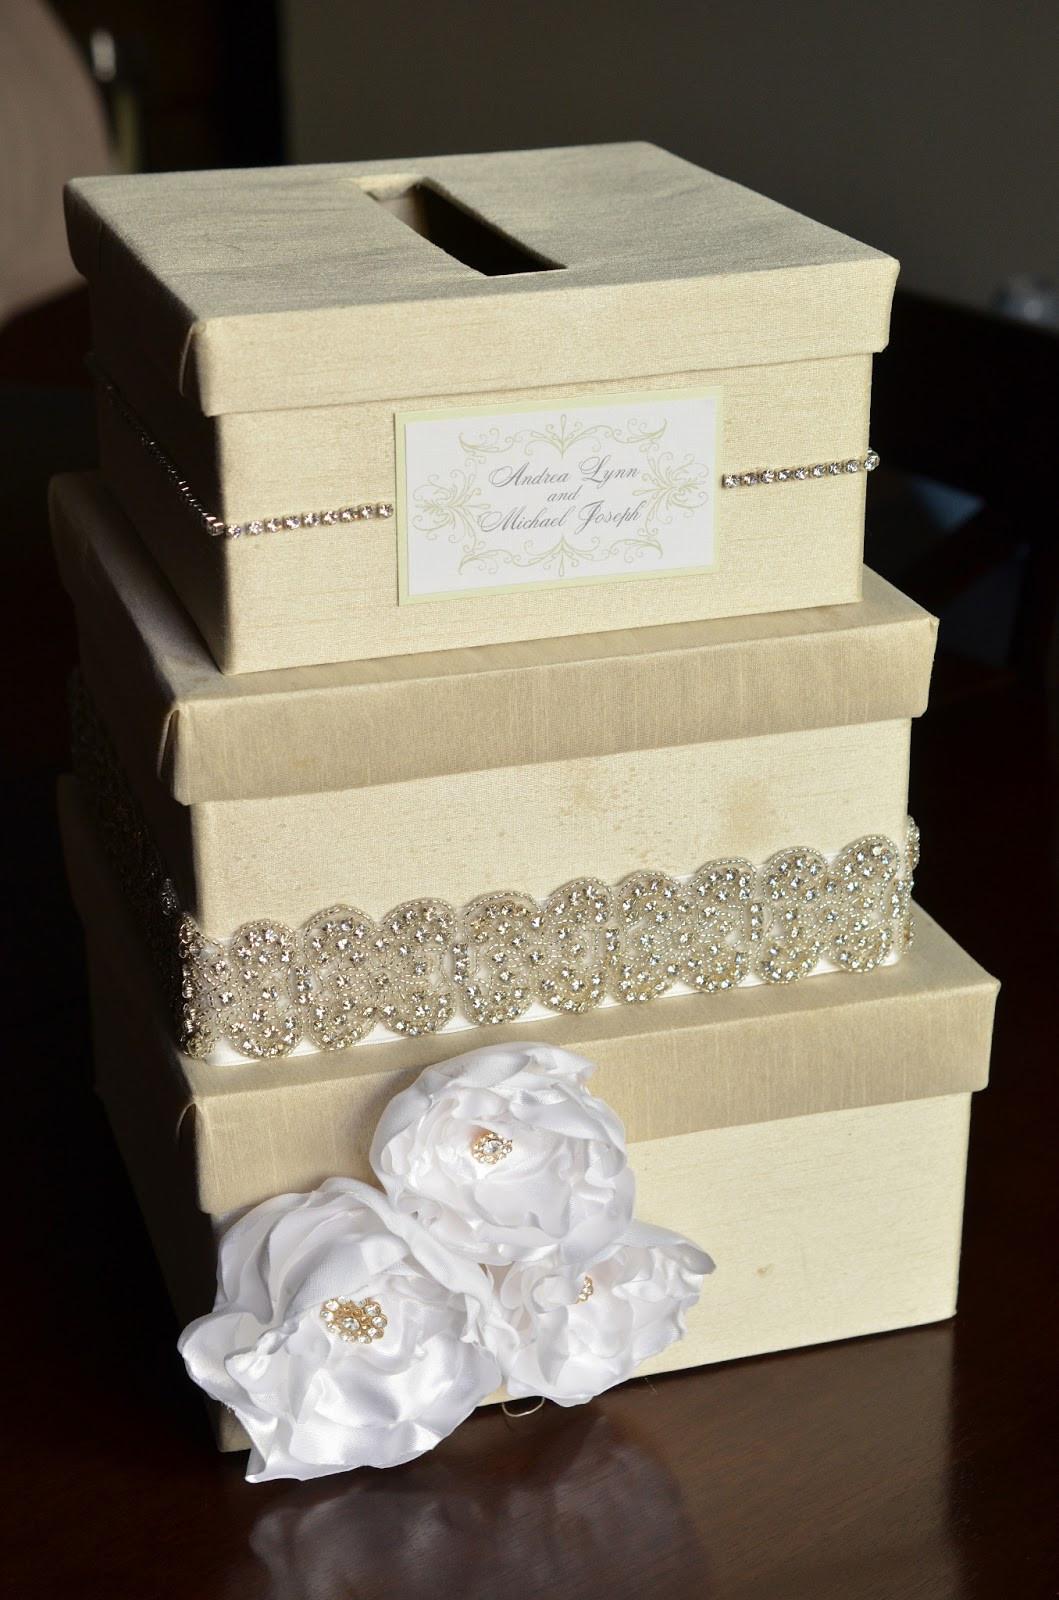 Best ideas about DIY Wedding Cards . Save or Pin DIY Wedding Card Box Tutorial Andrea Lynn HANDMADE Now.